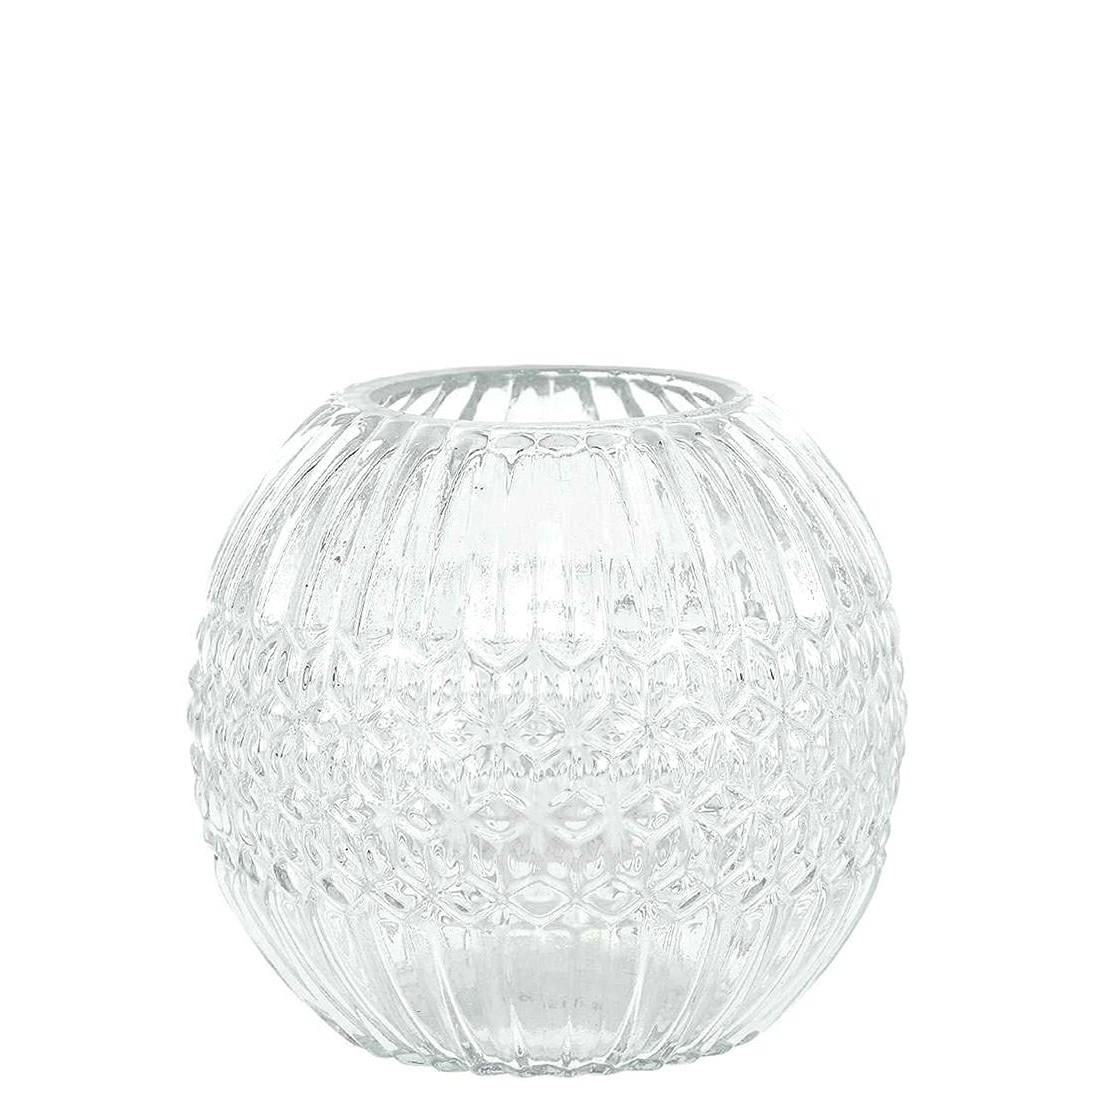 Vaso Decorativo de Vidro 10cm Aquario Transparente